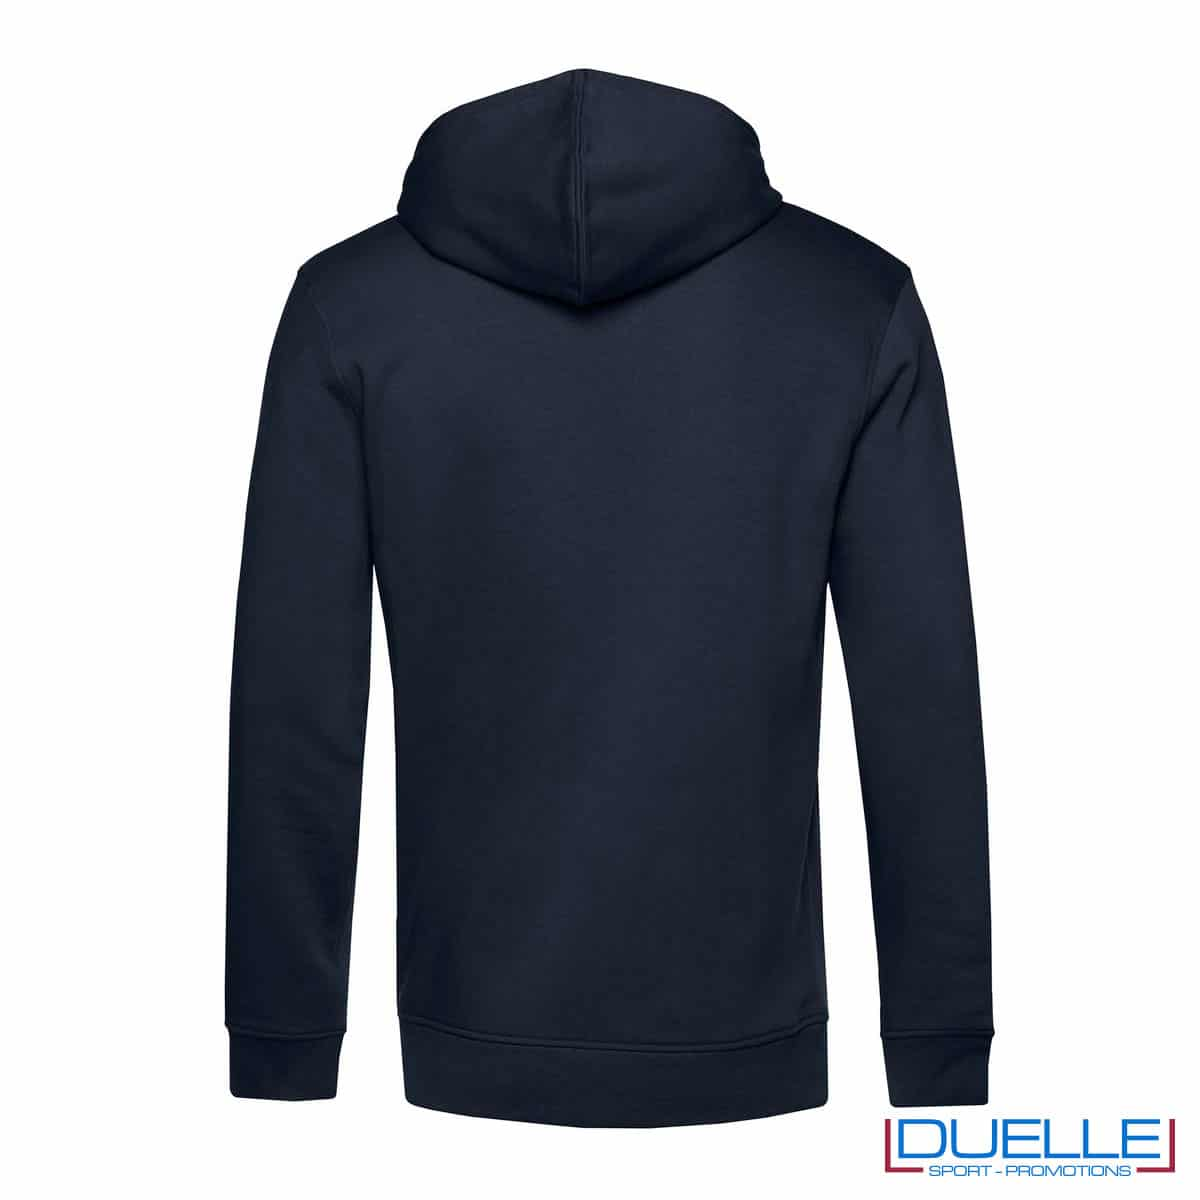 Felpa eco-friendly in cotone e R-PET blu navy retro